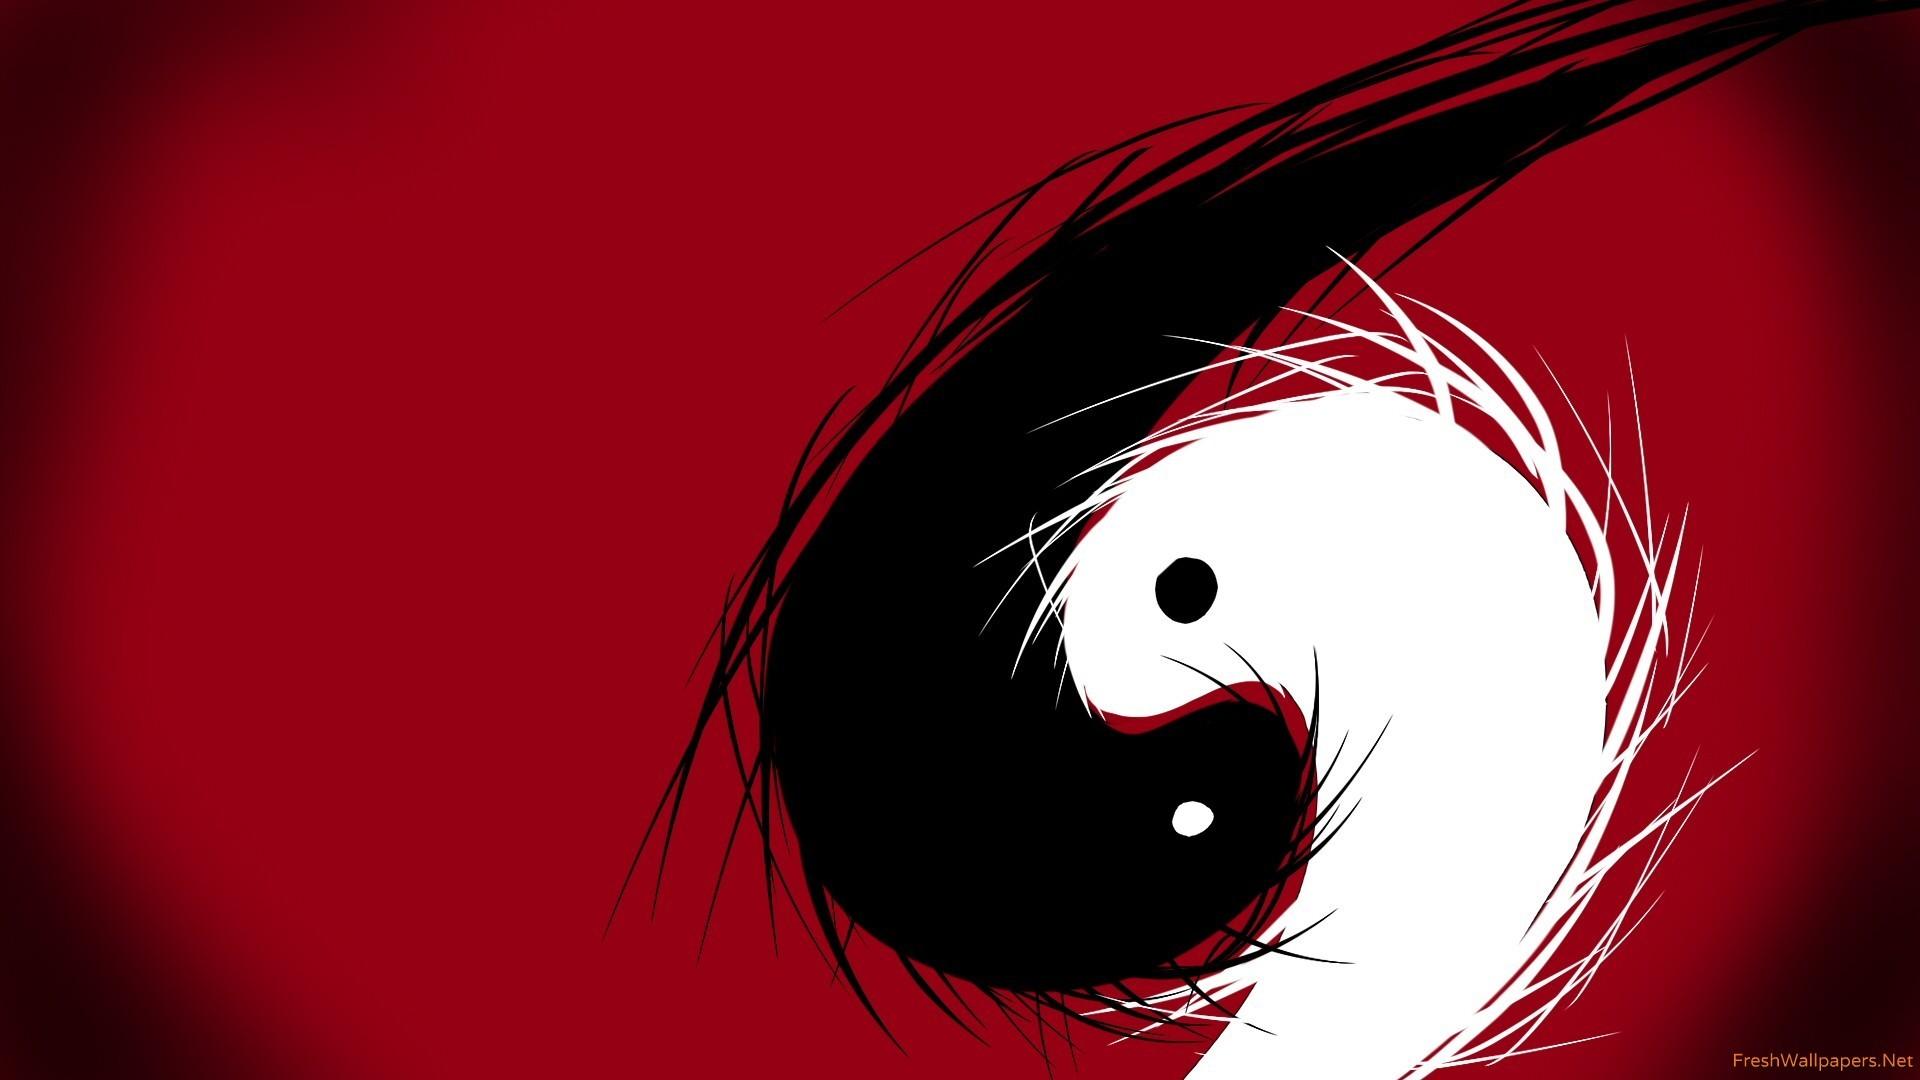 Yin yang backgrounds 57 images - Yin and yang wallpaper ...